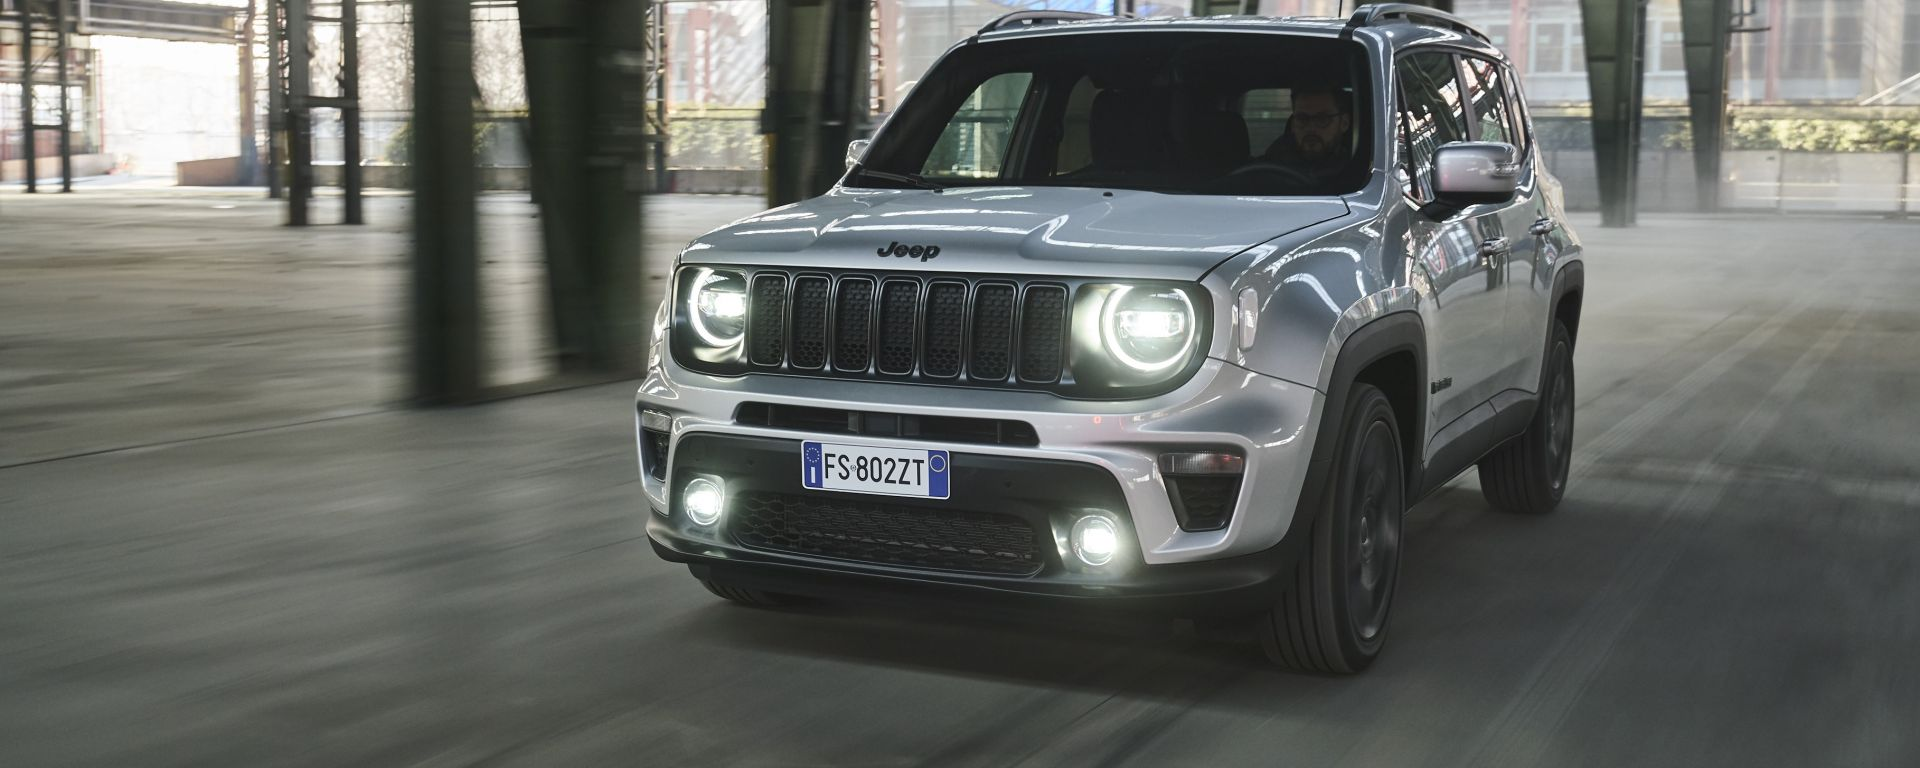 Nuovo Jeep Renegade: Allestimento S